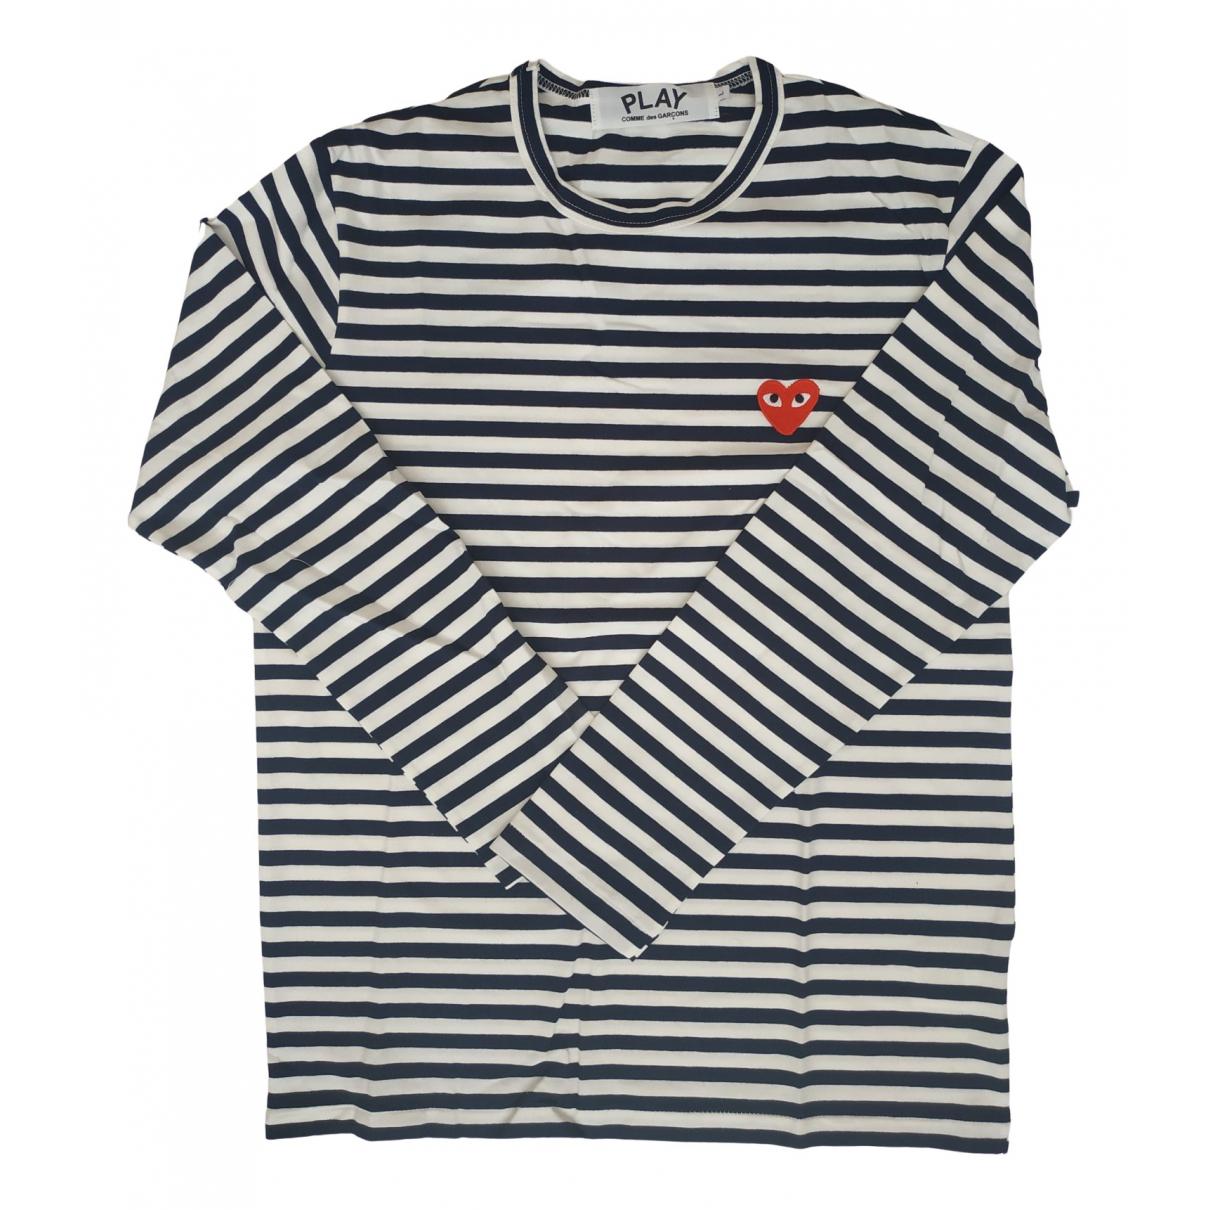 Camiseta Play Comme Des Garcons